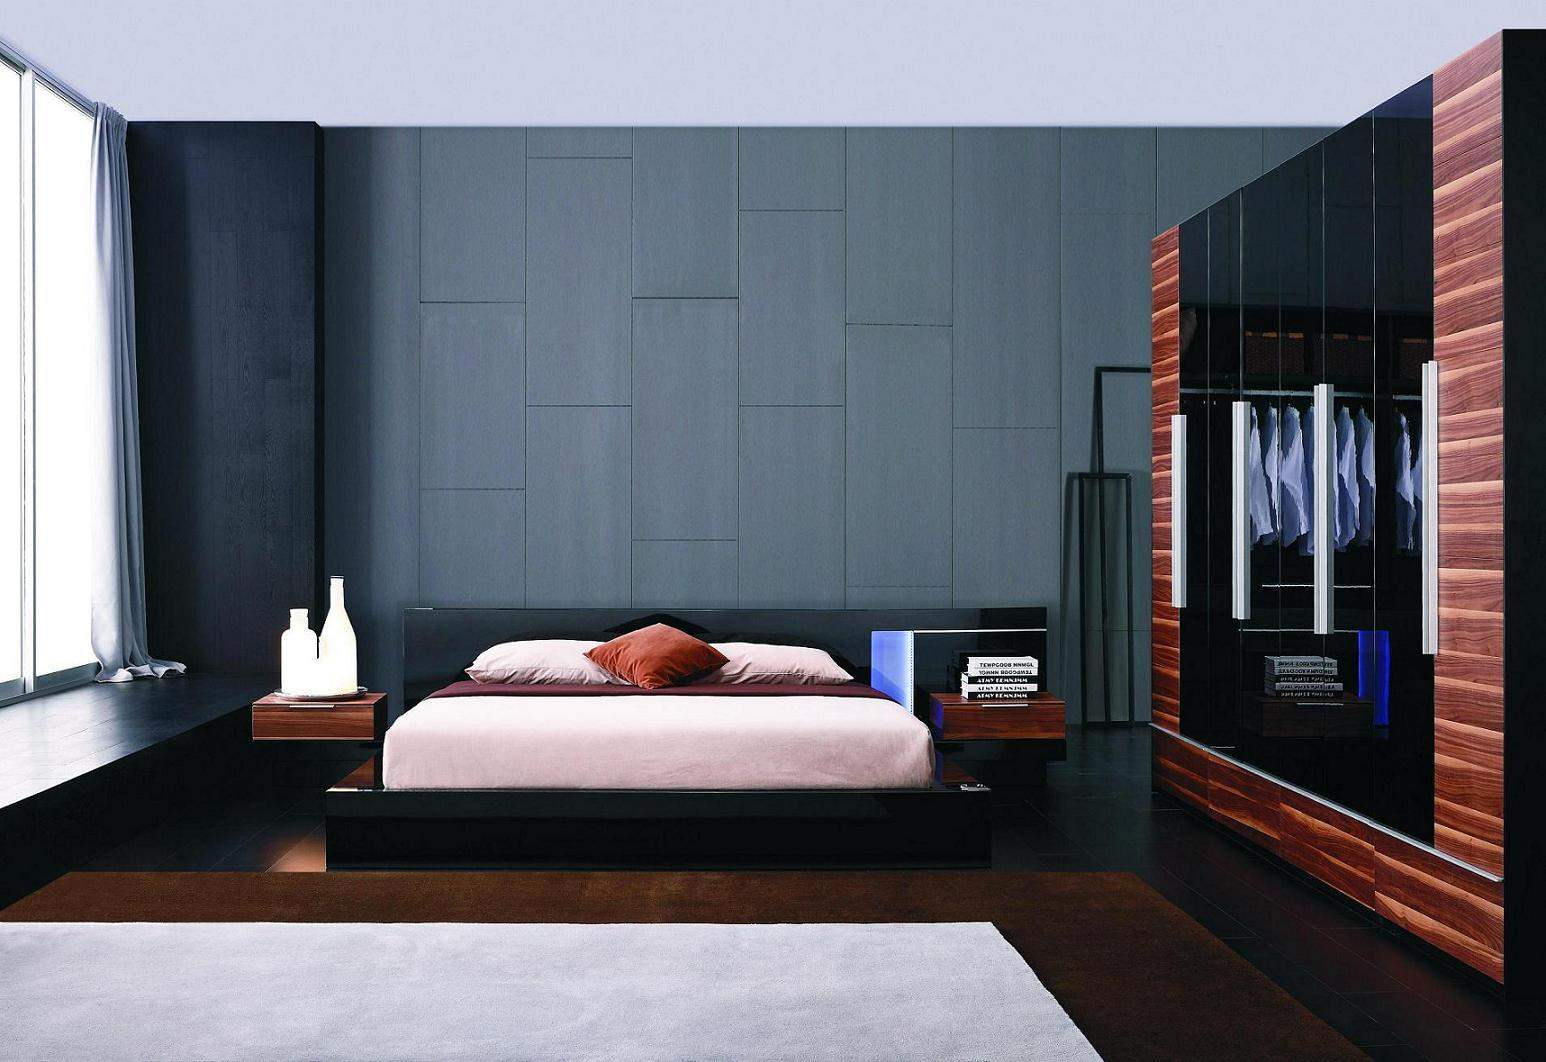 Cute Blue Light Kansas Master Bedroom Set Ikea Master Bedroom Sets Rustic Bedroom Sets Master Bedroom Furniture Exclusive Lear Designer Bedroom Set houzz-03 Master Bedroom Sets